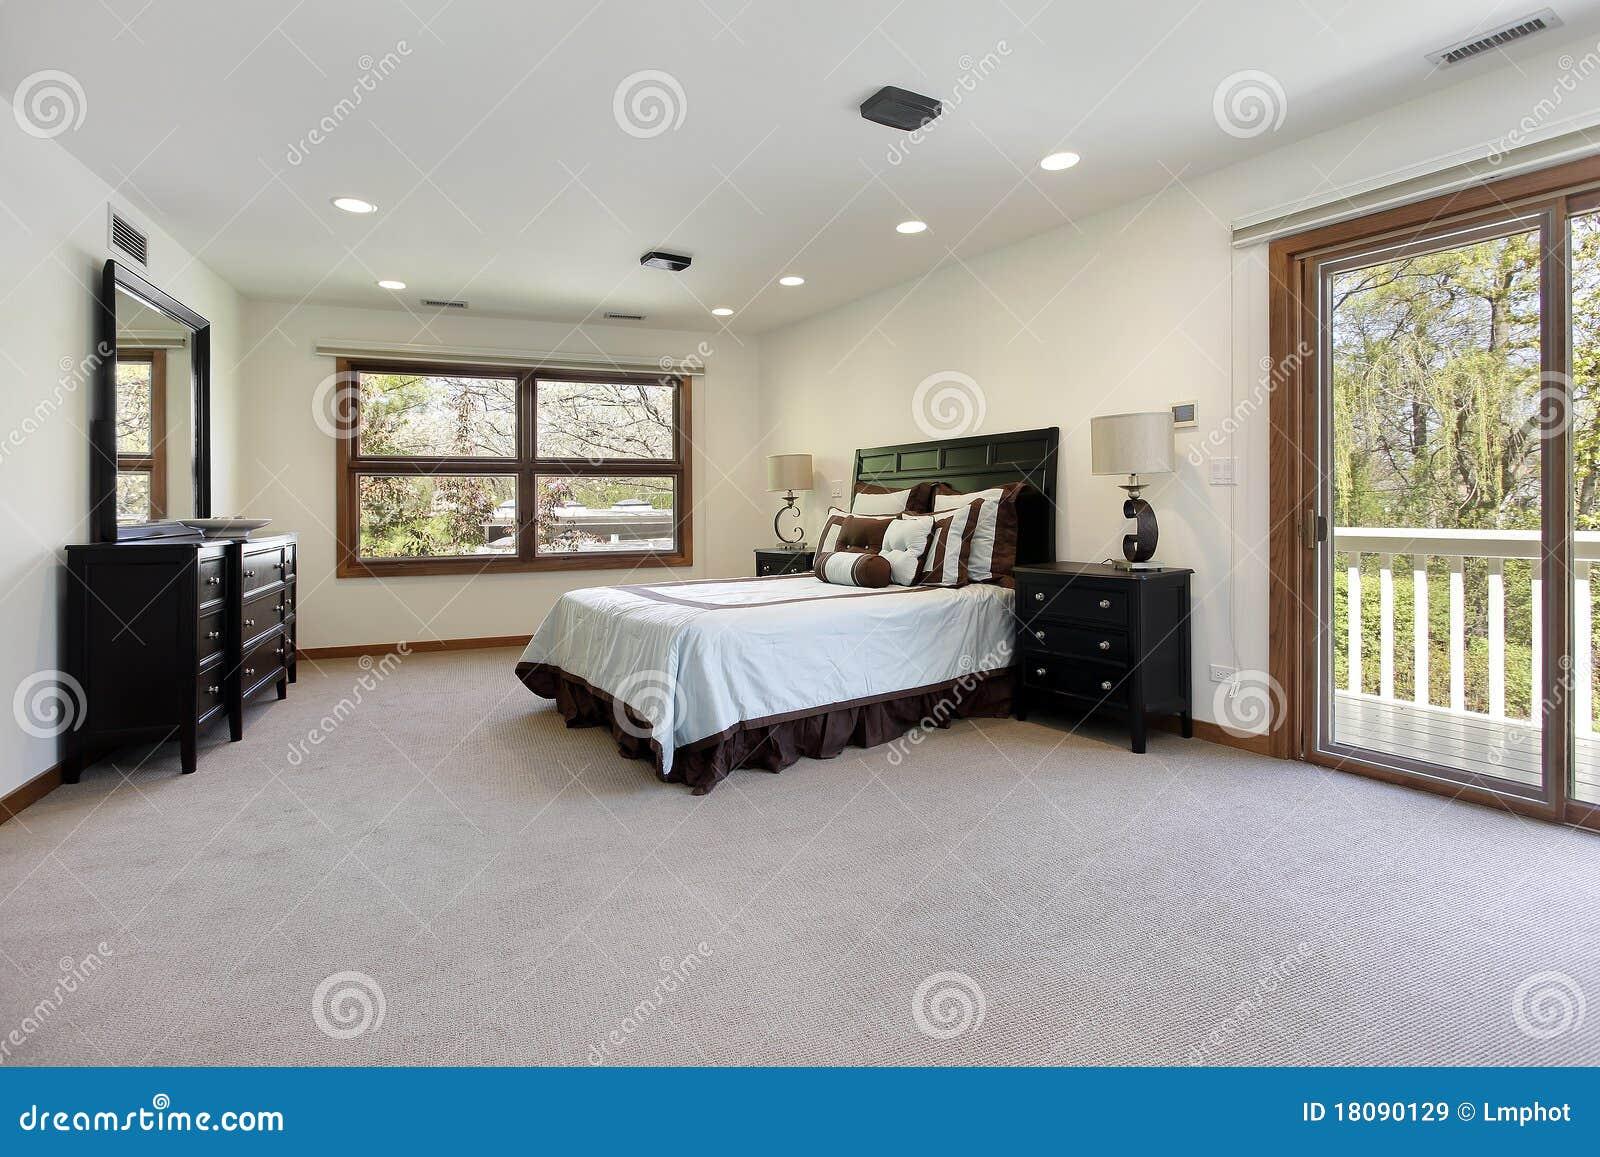 Master Bedroom With Door To Balcony Stock Image Image 18090129